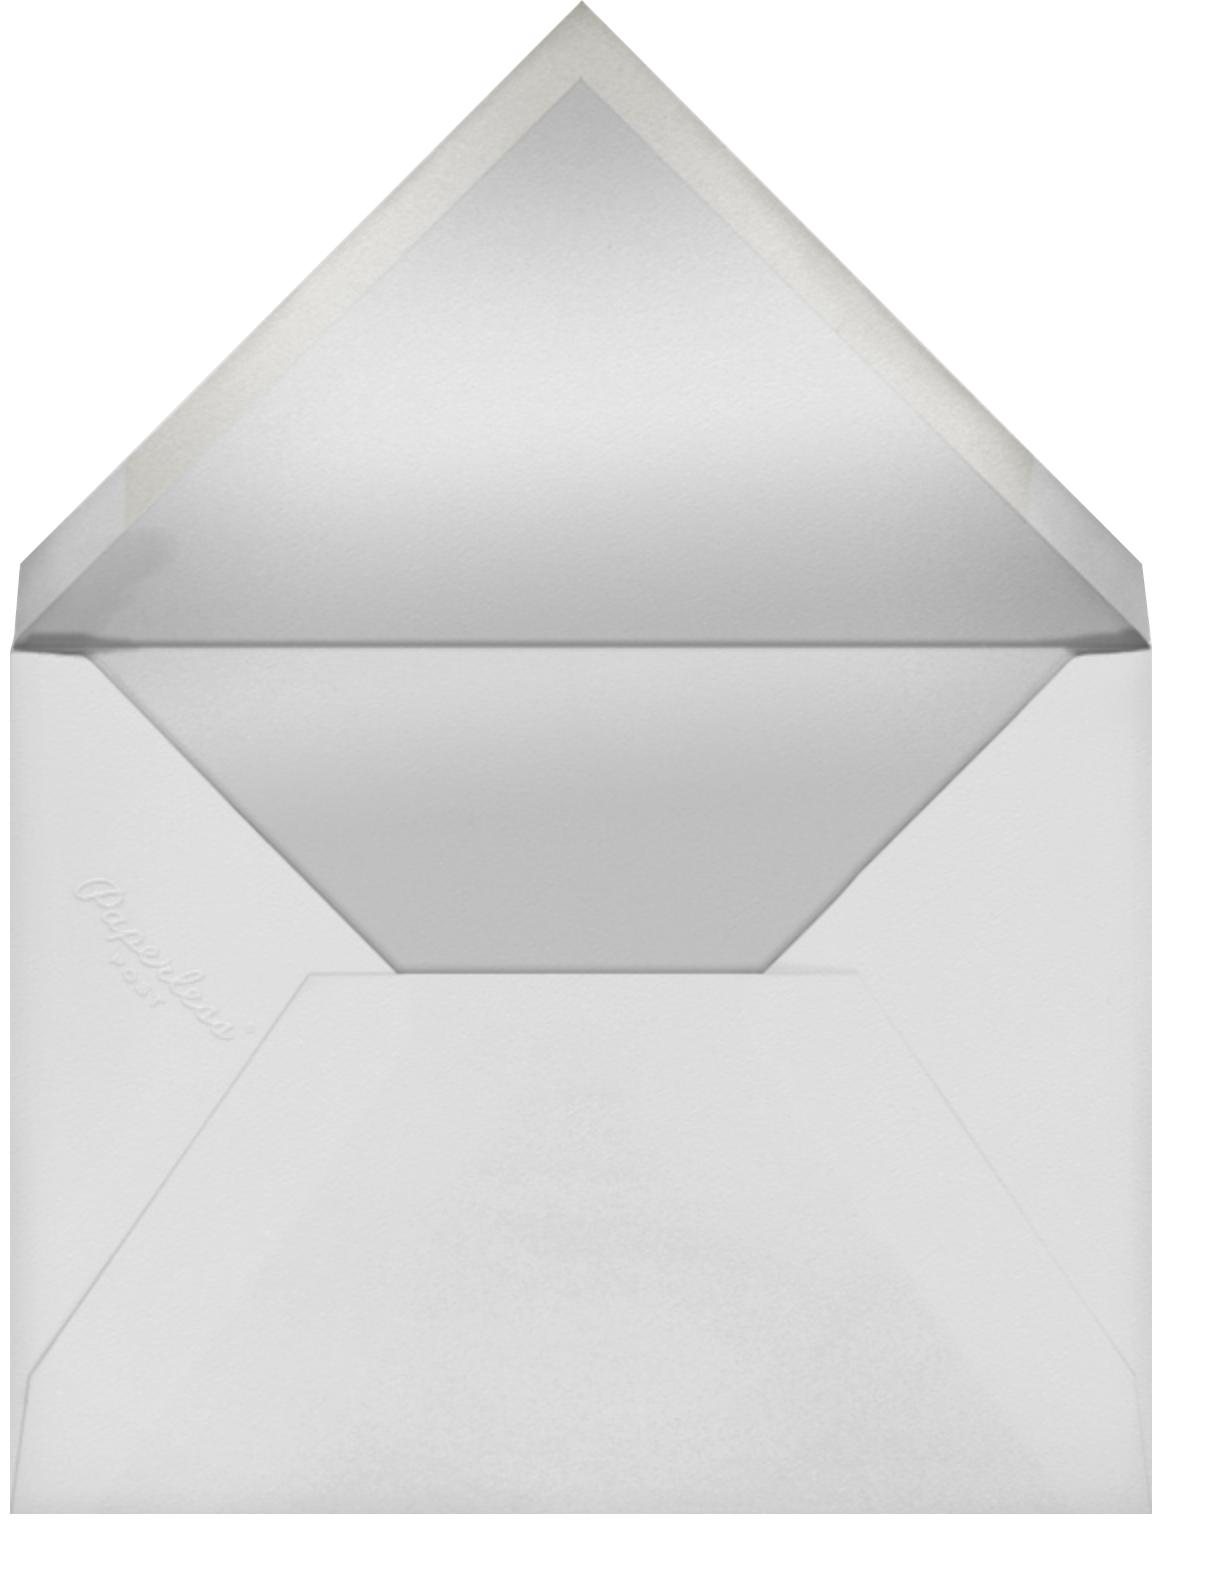 Rose Floral Ikat (Menu) - White - Oscar de la Renta - Menus and programs - envelope back